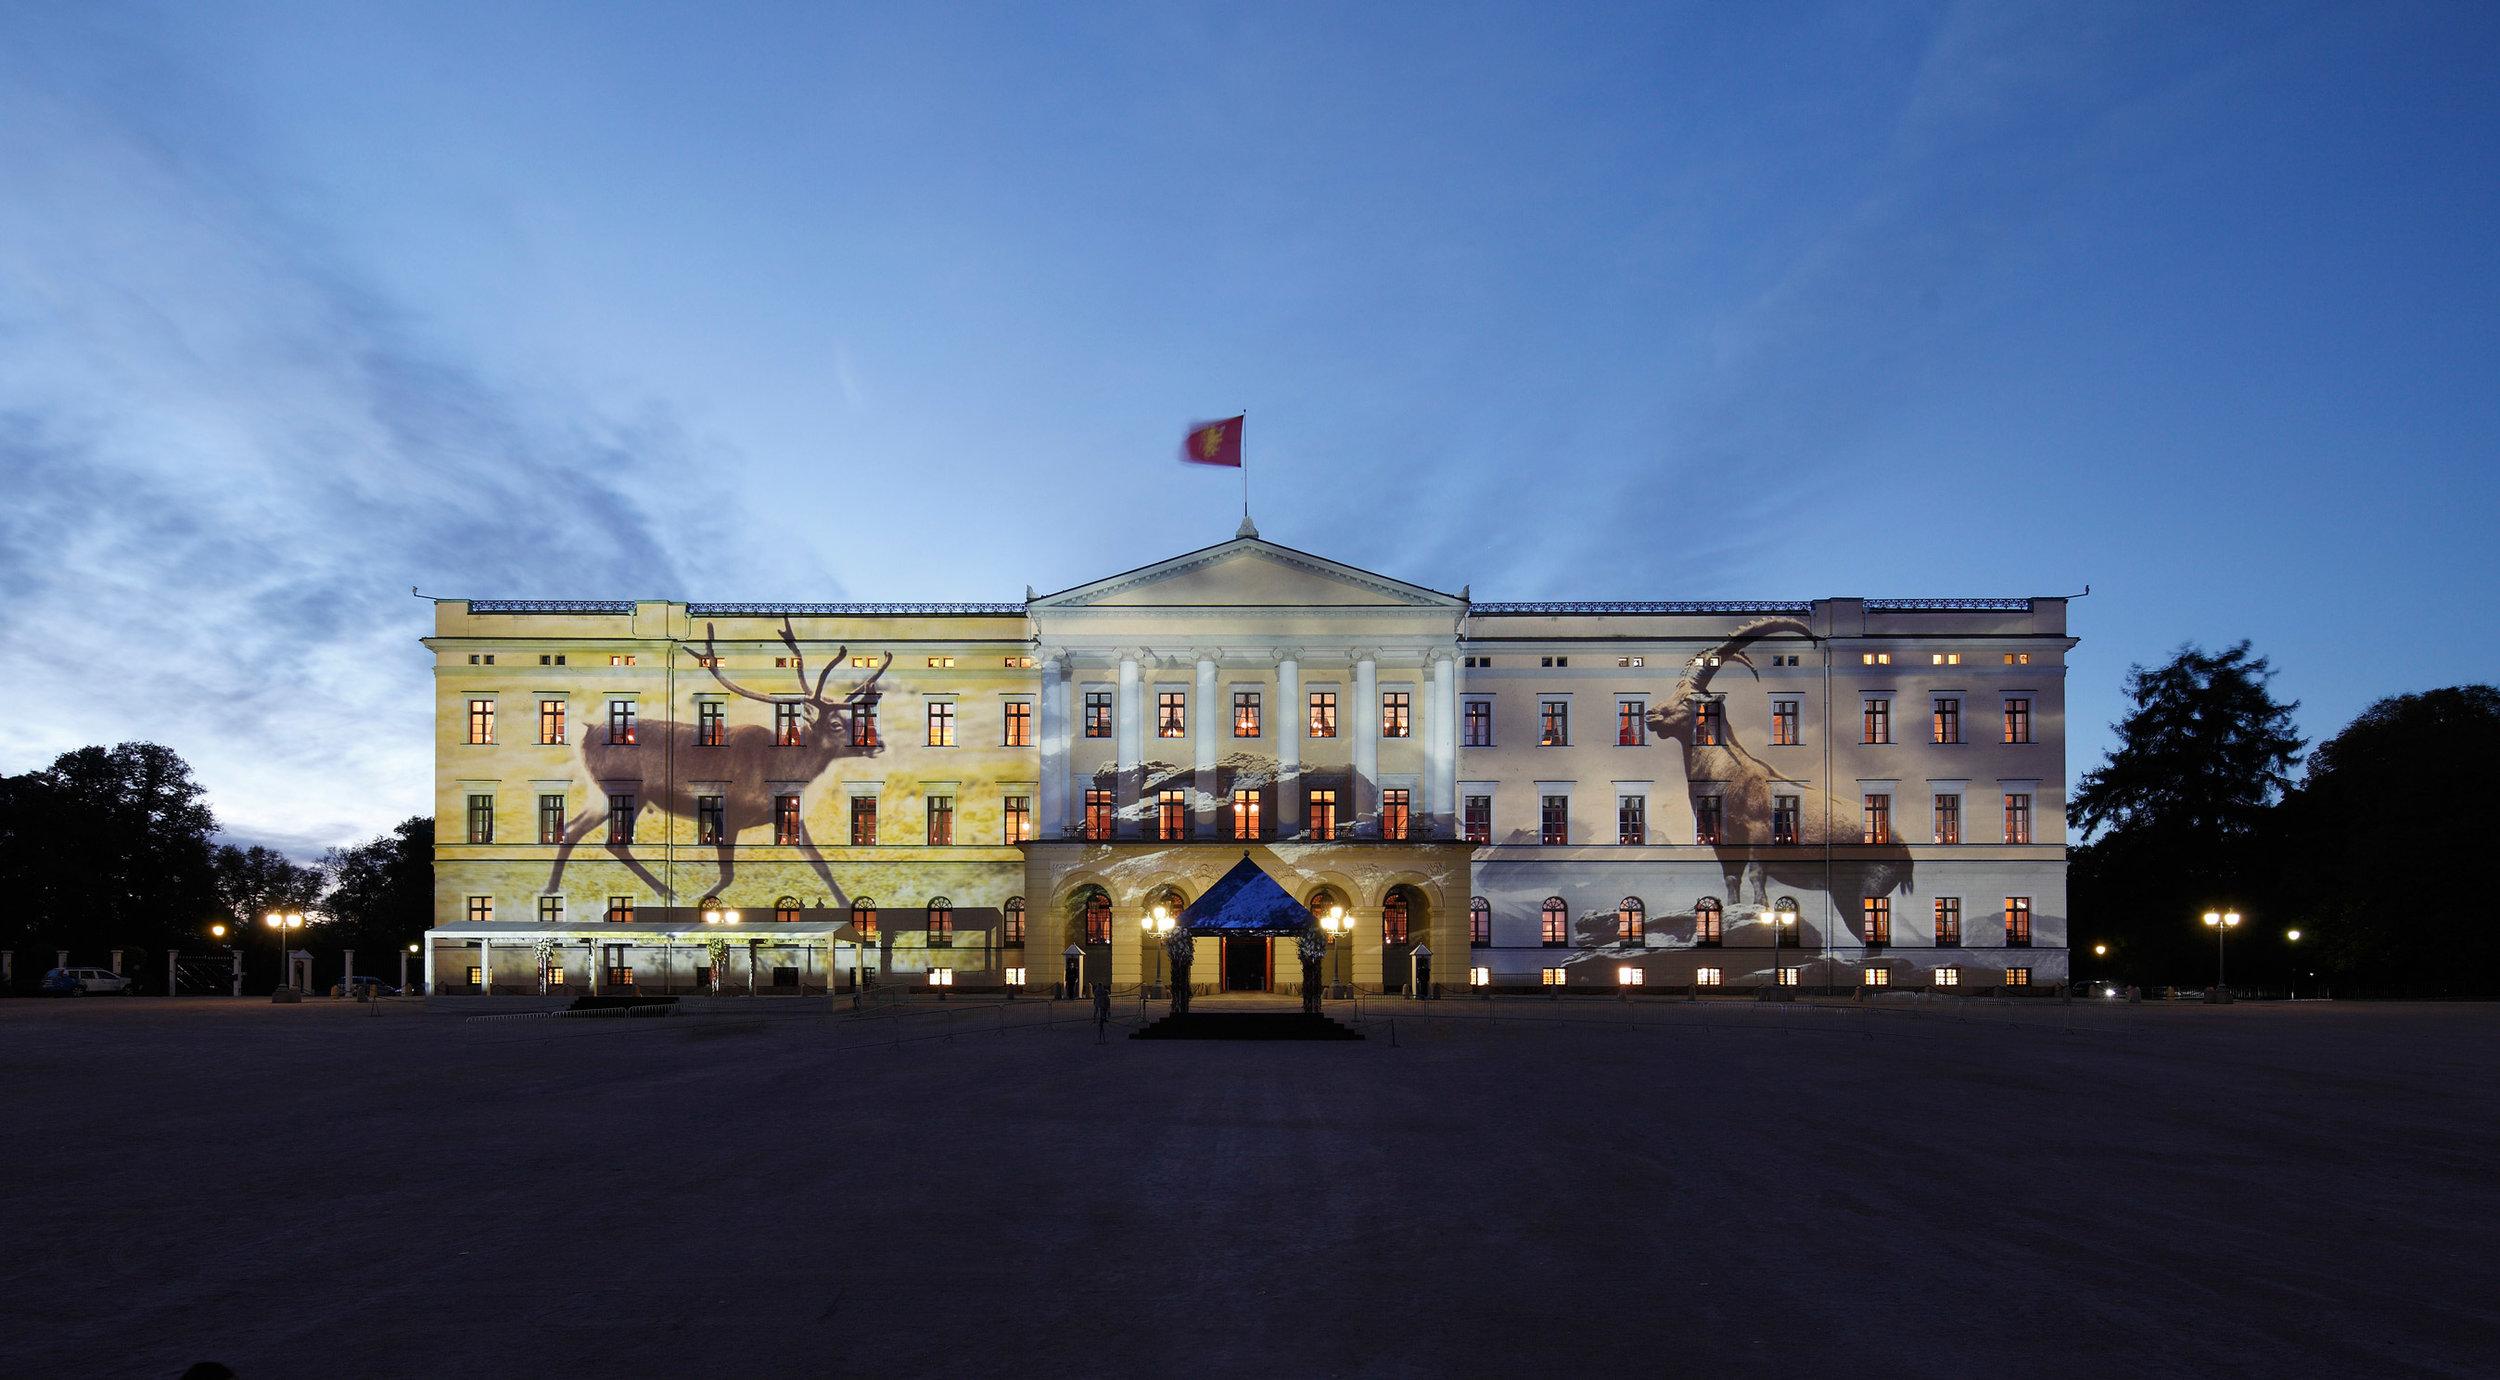 Oslo-Köngispalast_MG_9637.jpg